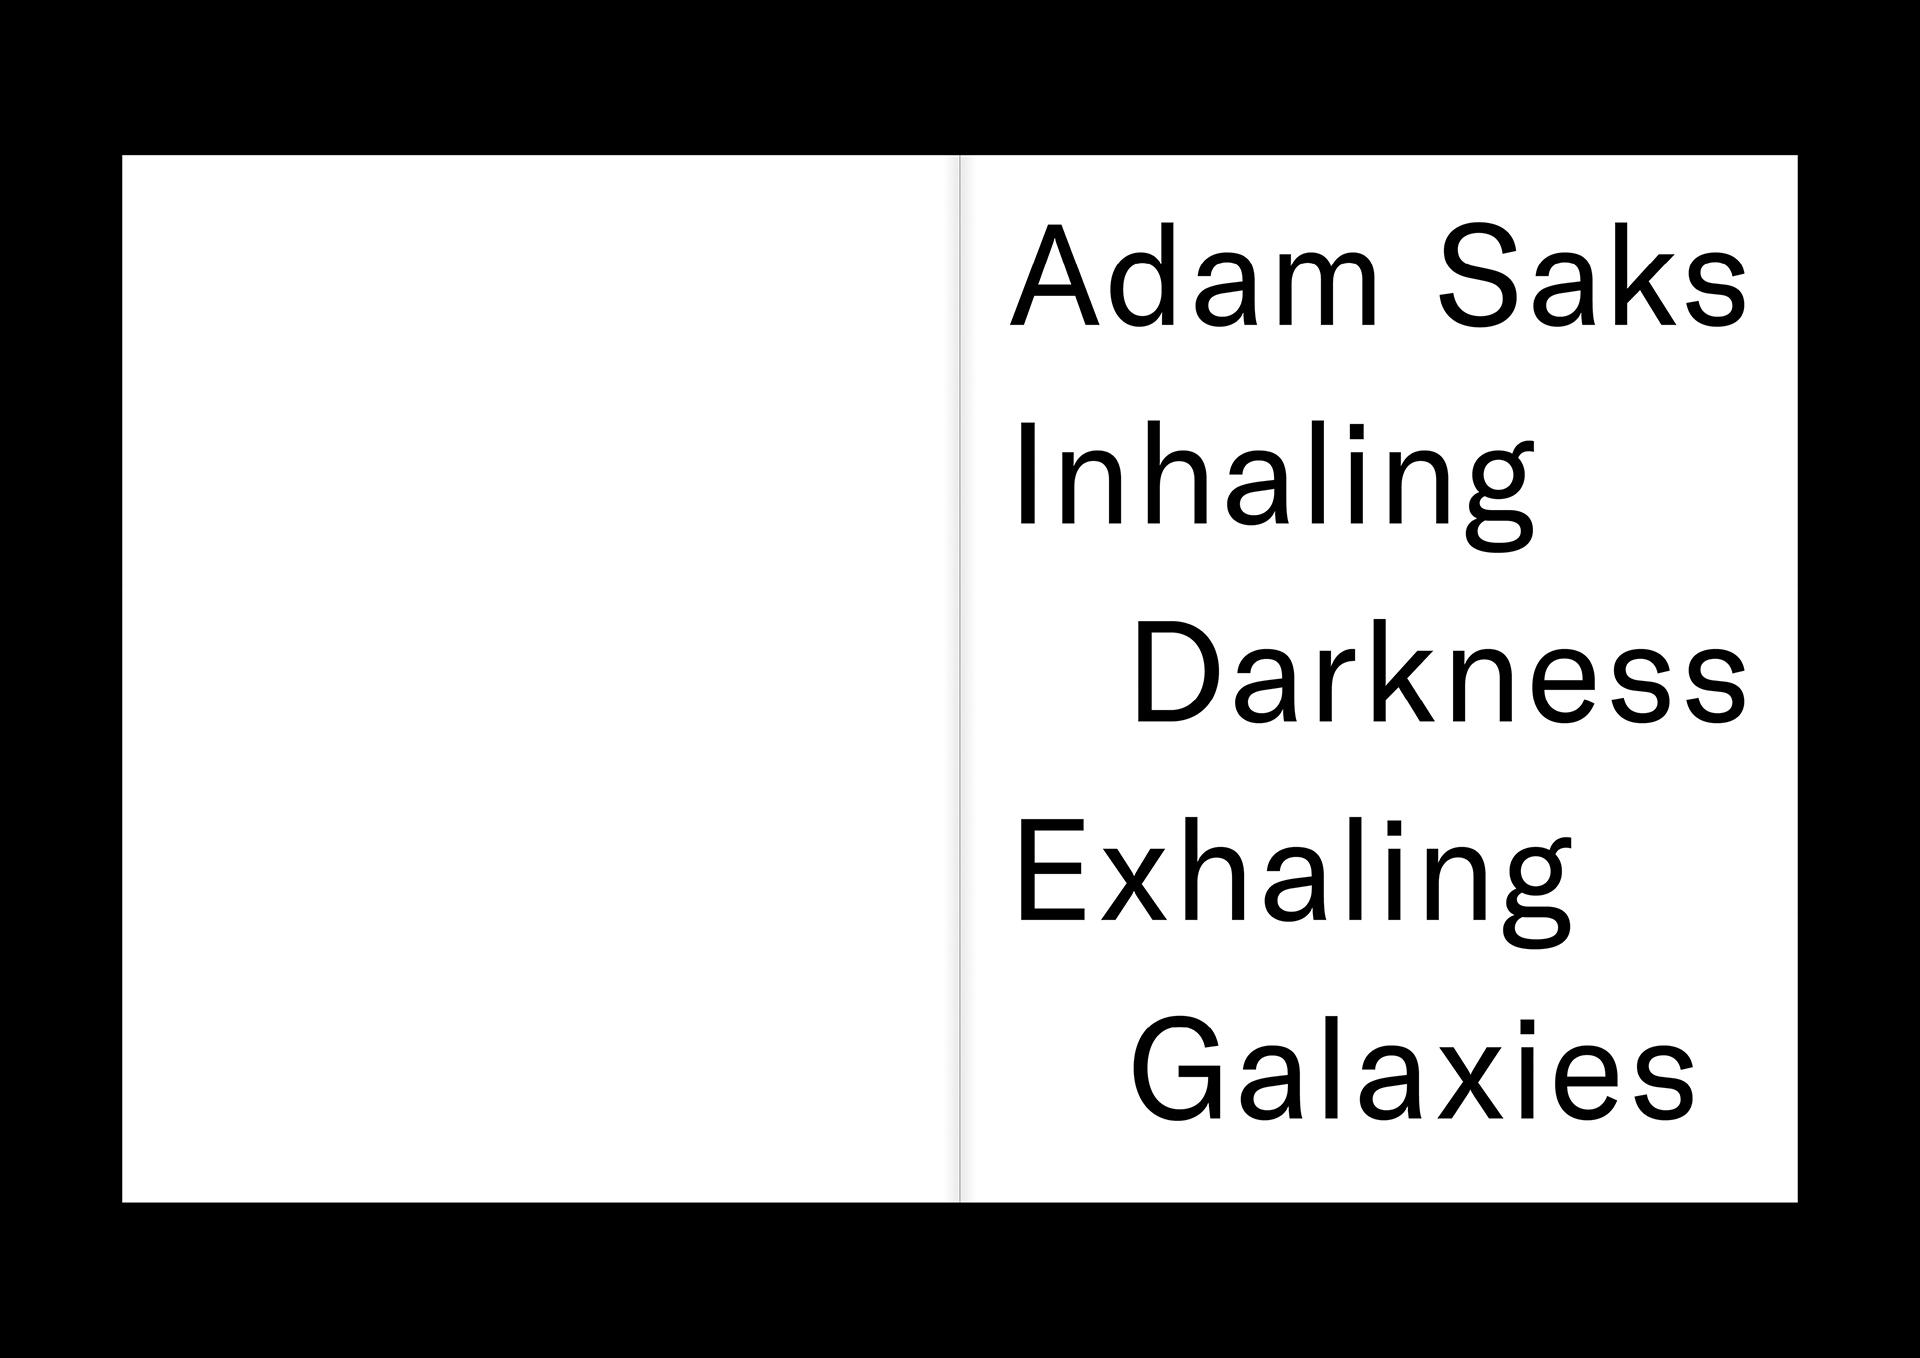 SMS_Adam_Saks_KVR_2